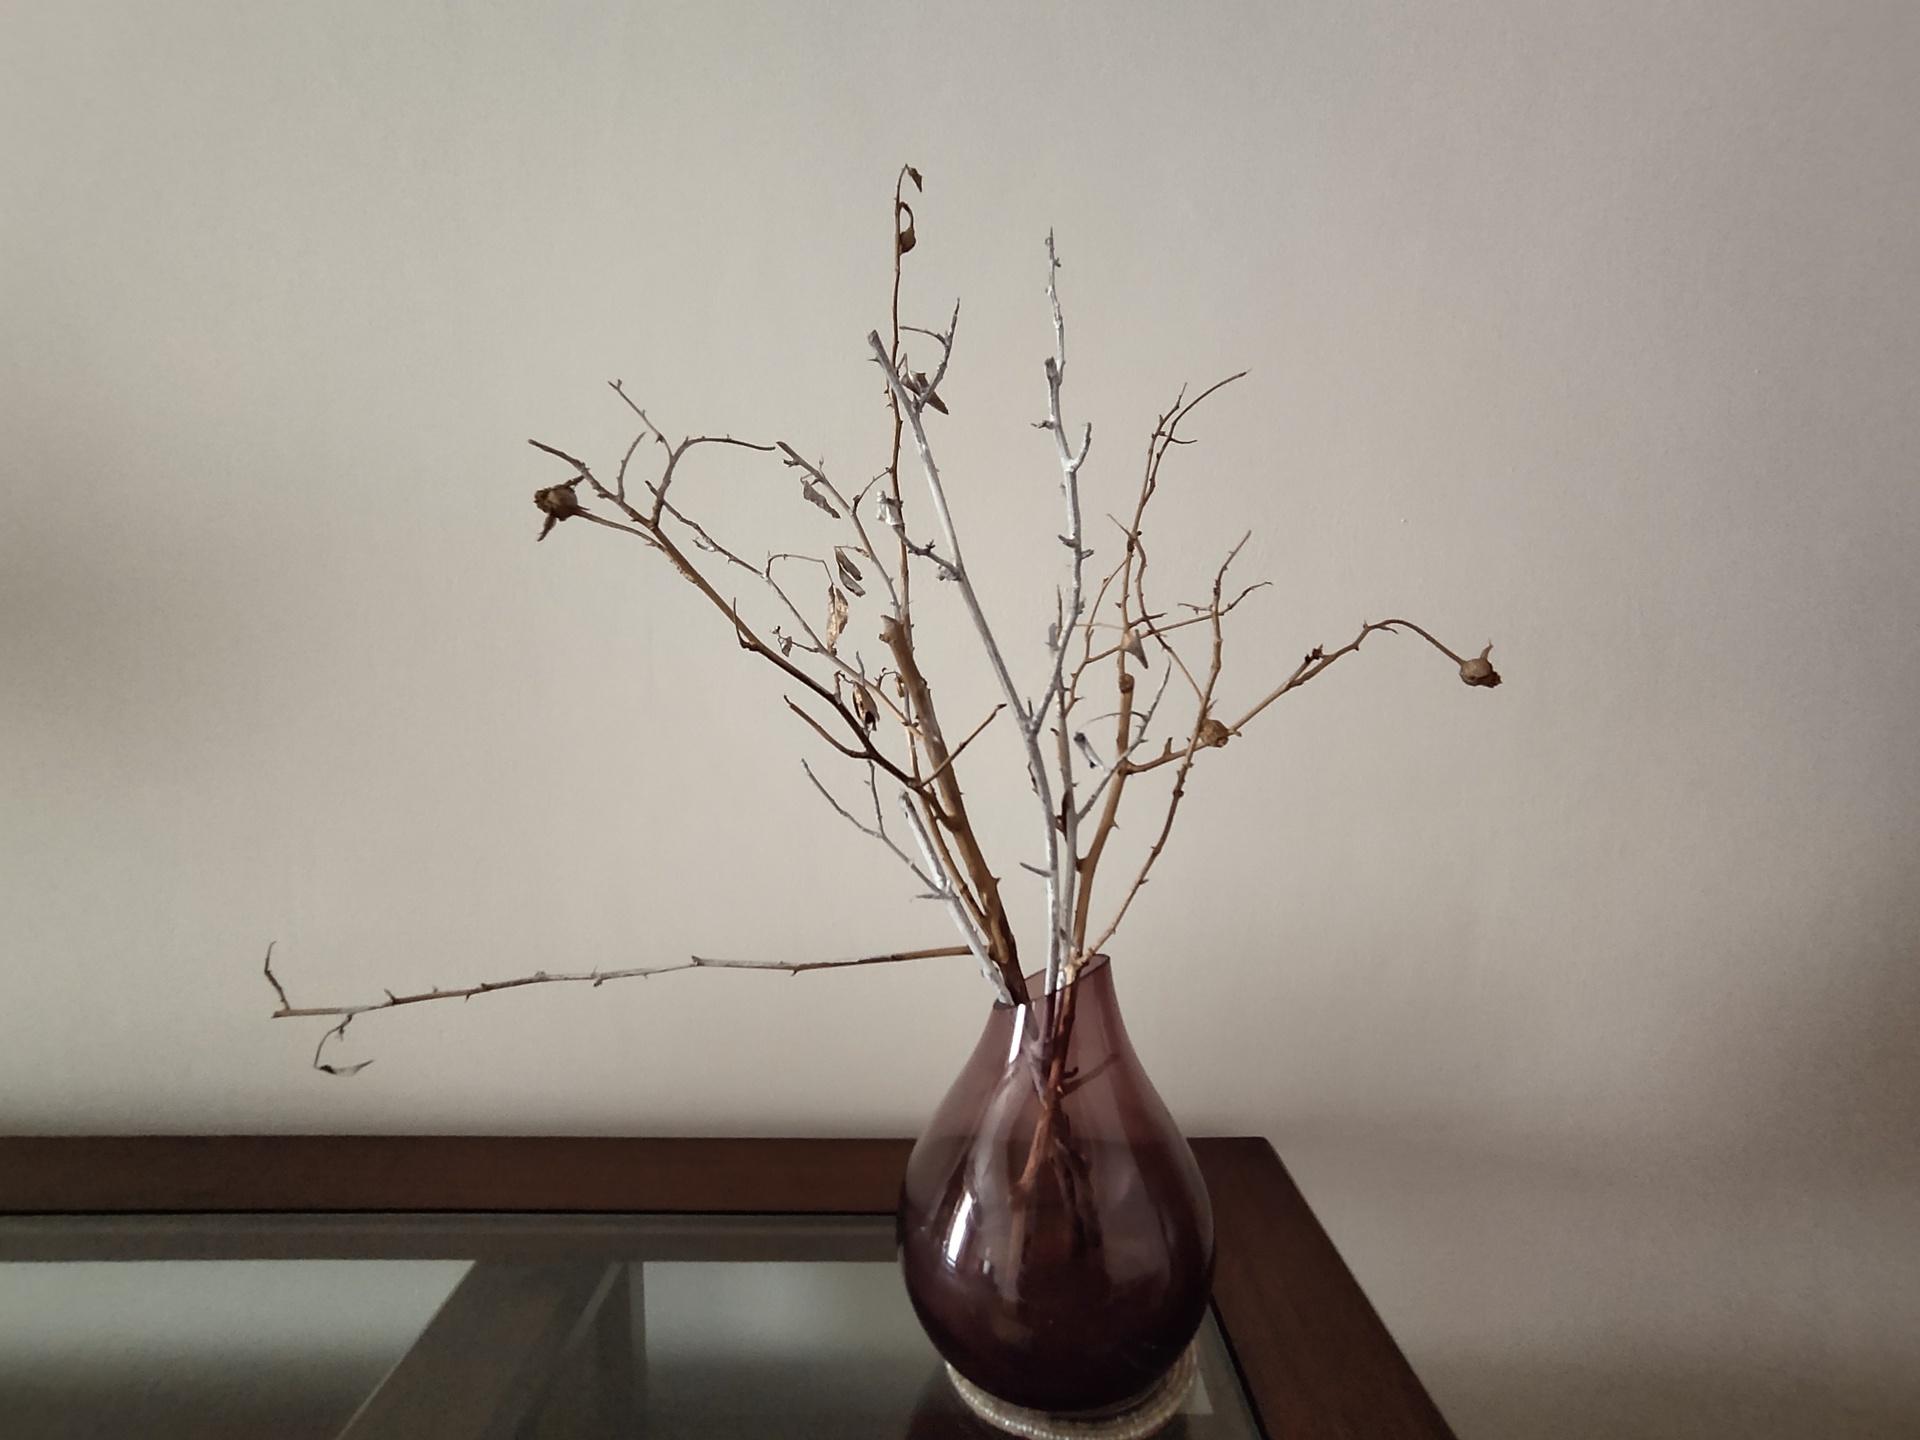 Vivo Z1x indoor flower vase camera sample